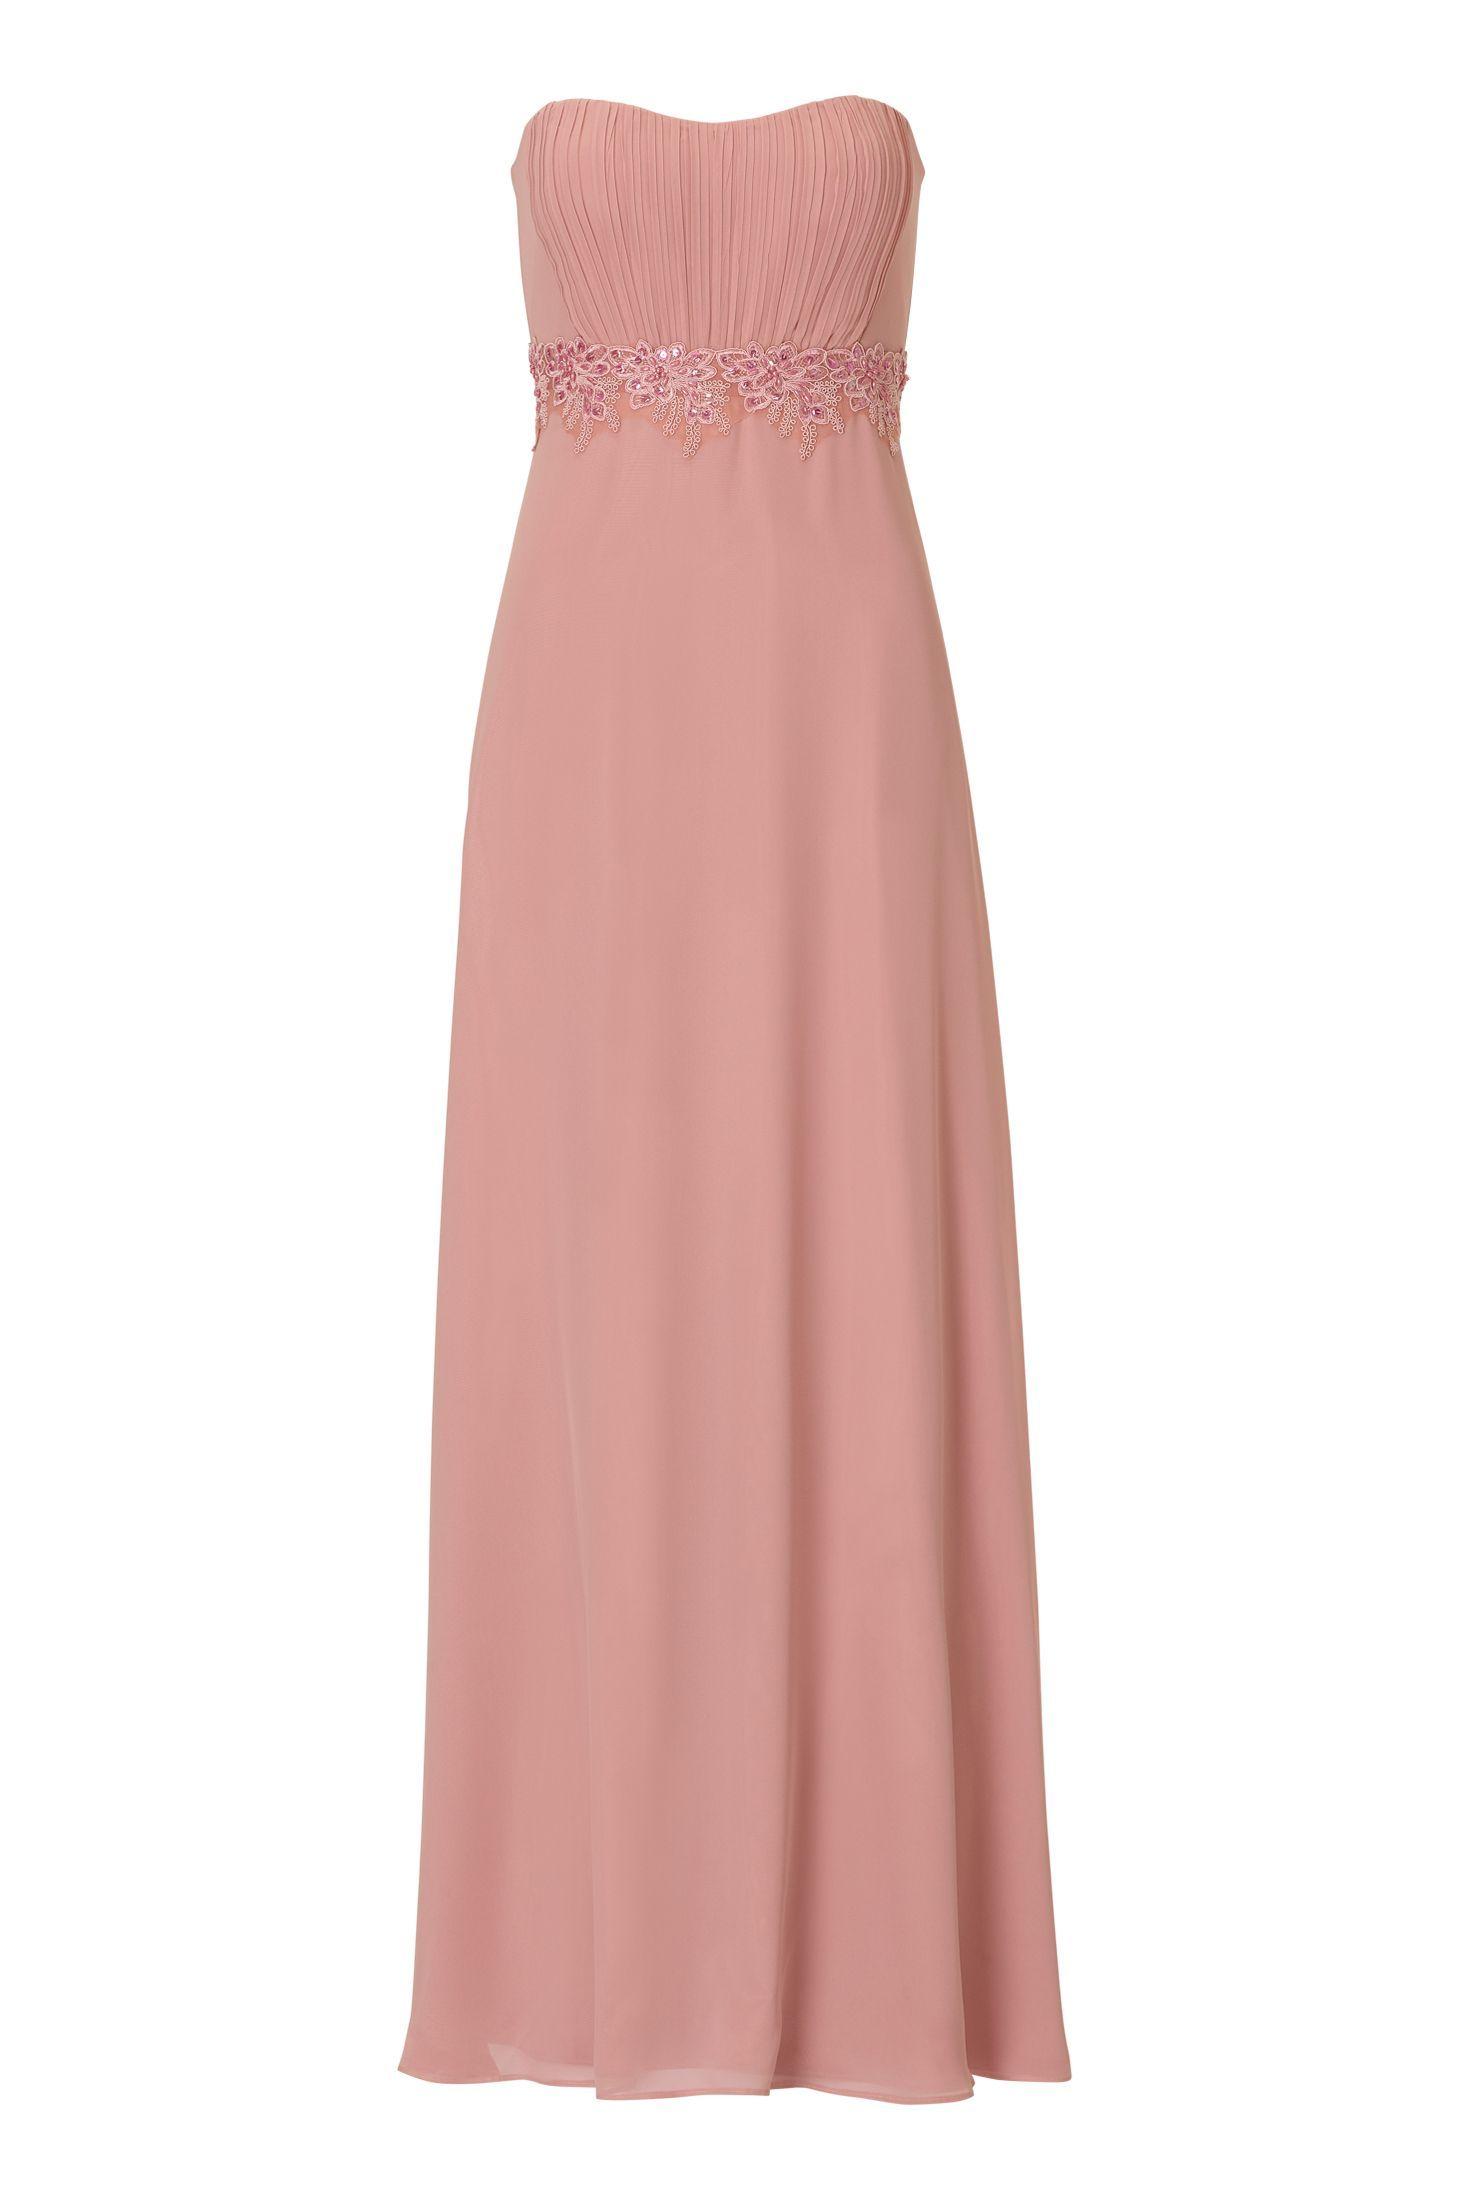 brautjungfernkleid chiffon rosa vera mont in 2020